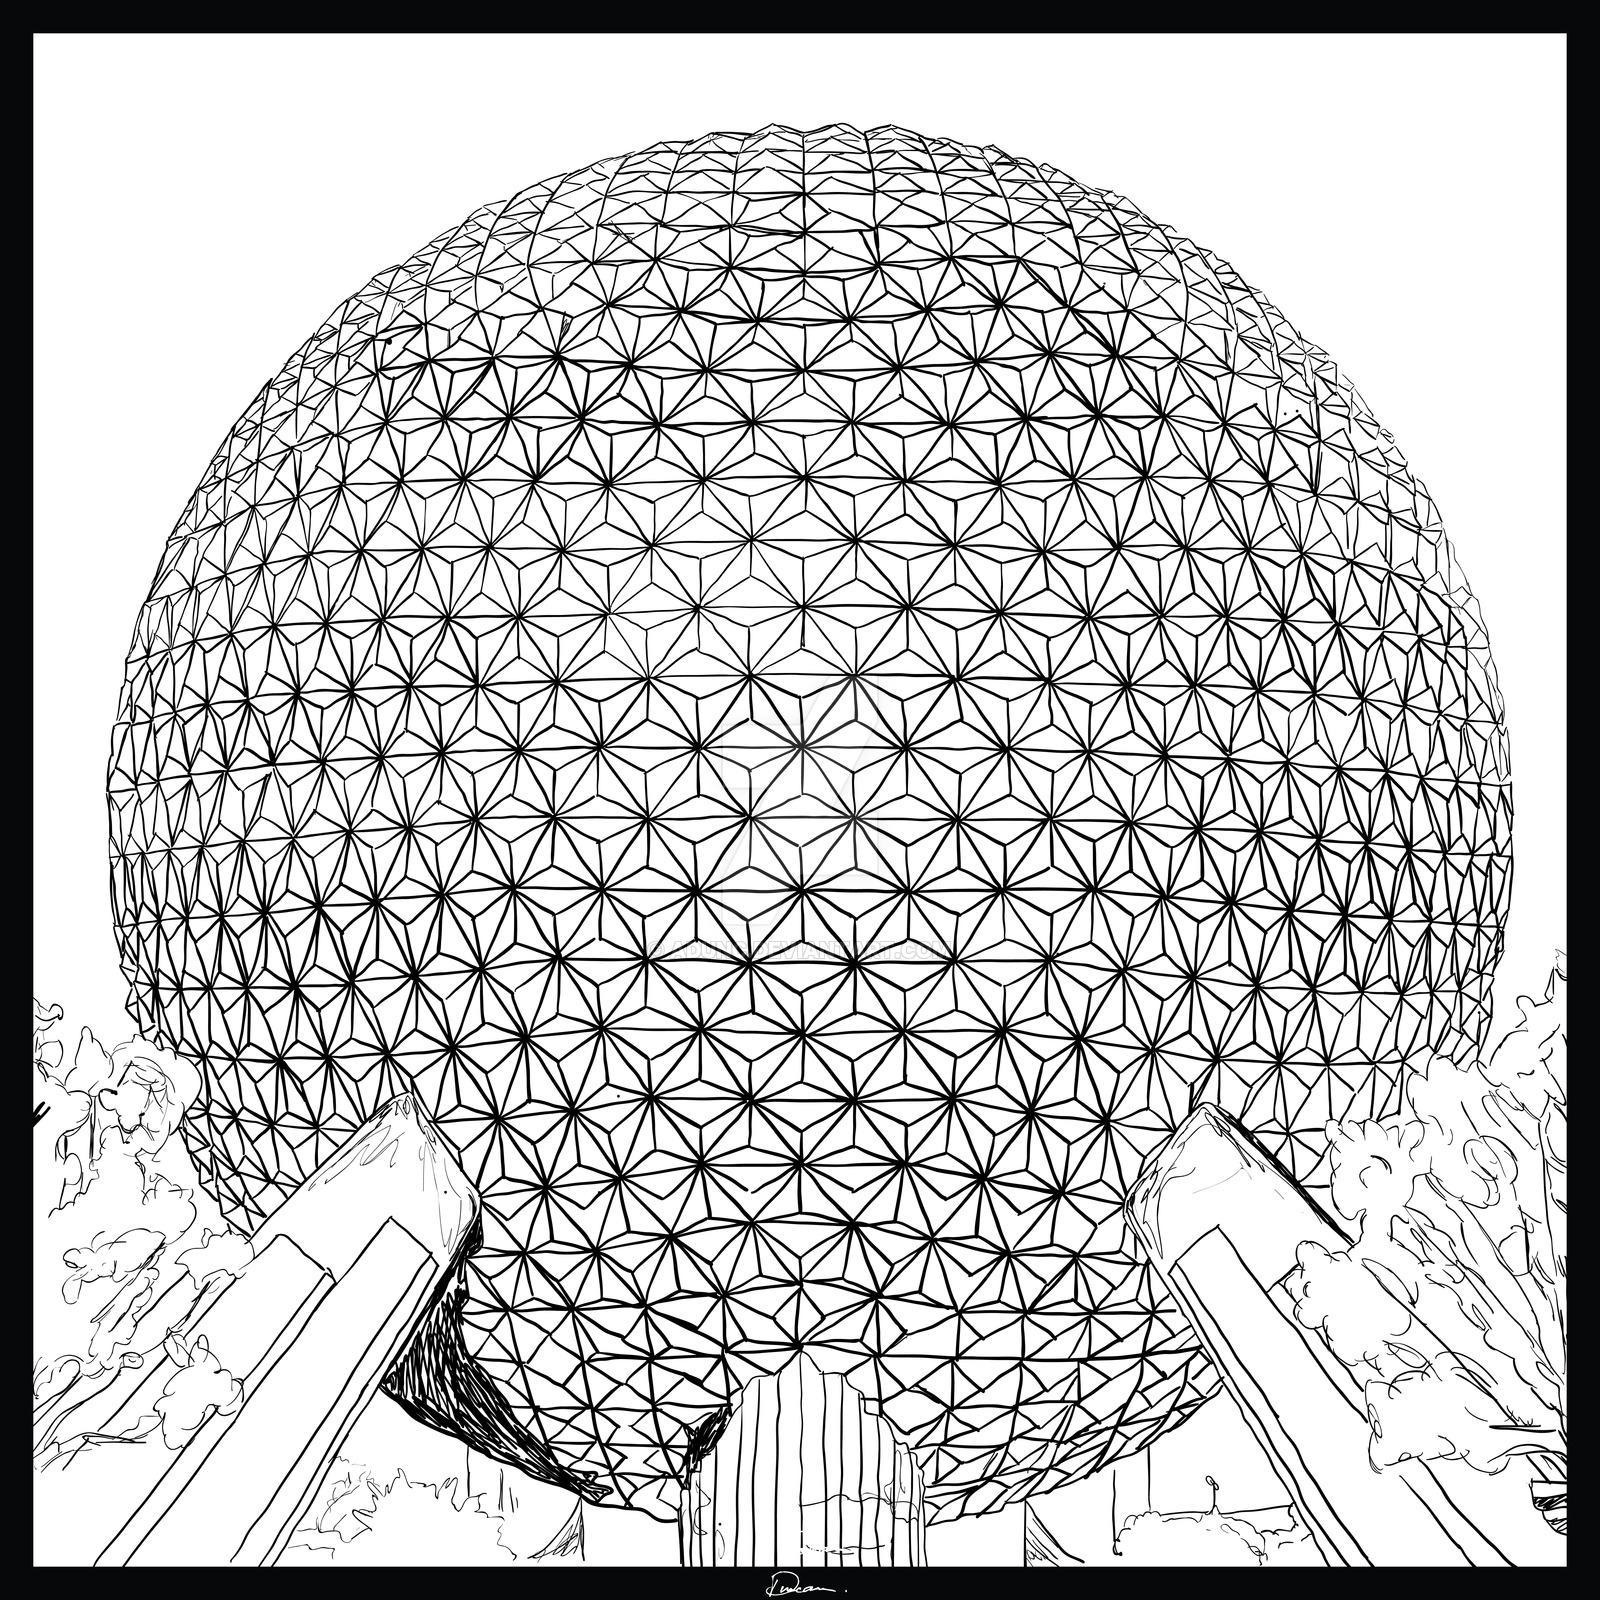 1600x1600 Spaceship Earth By Adunc